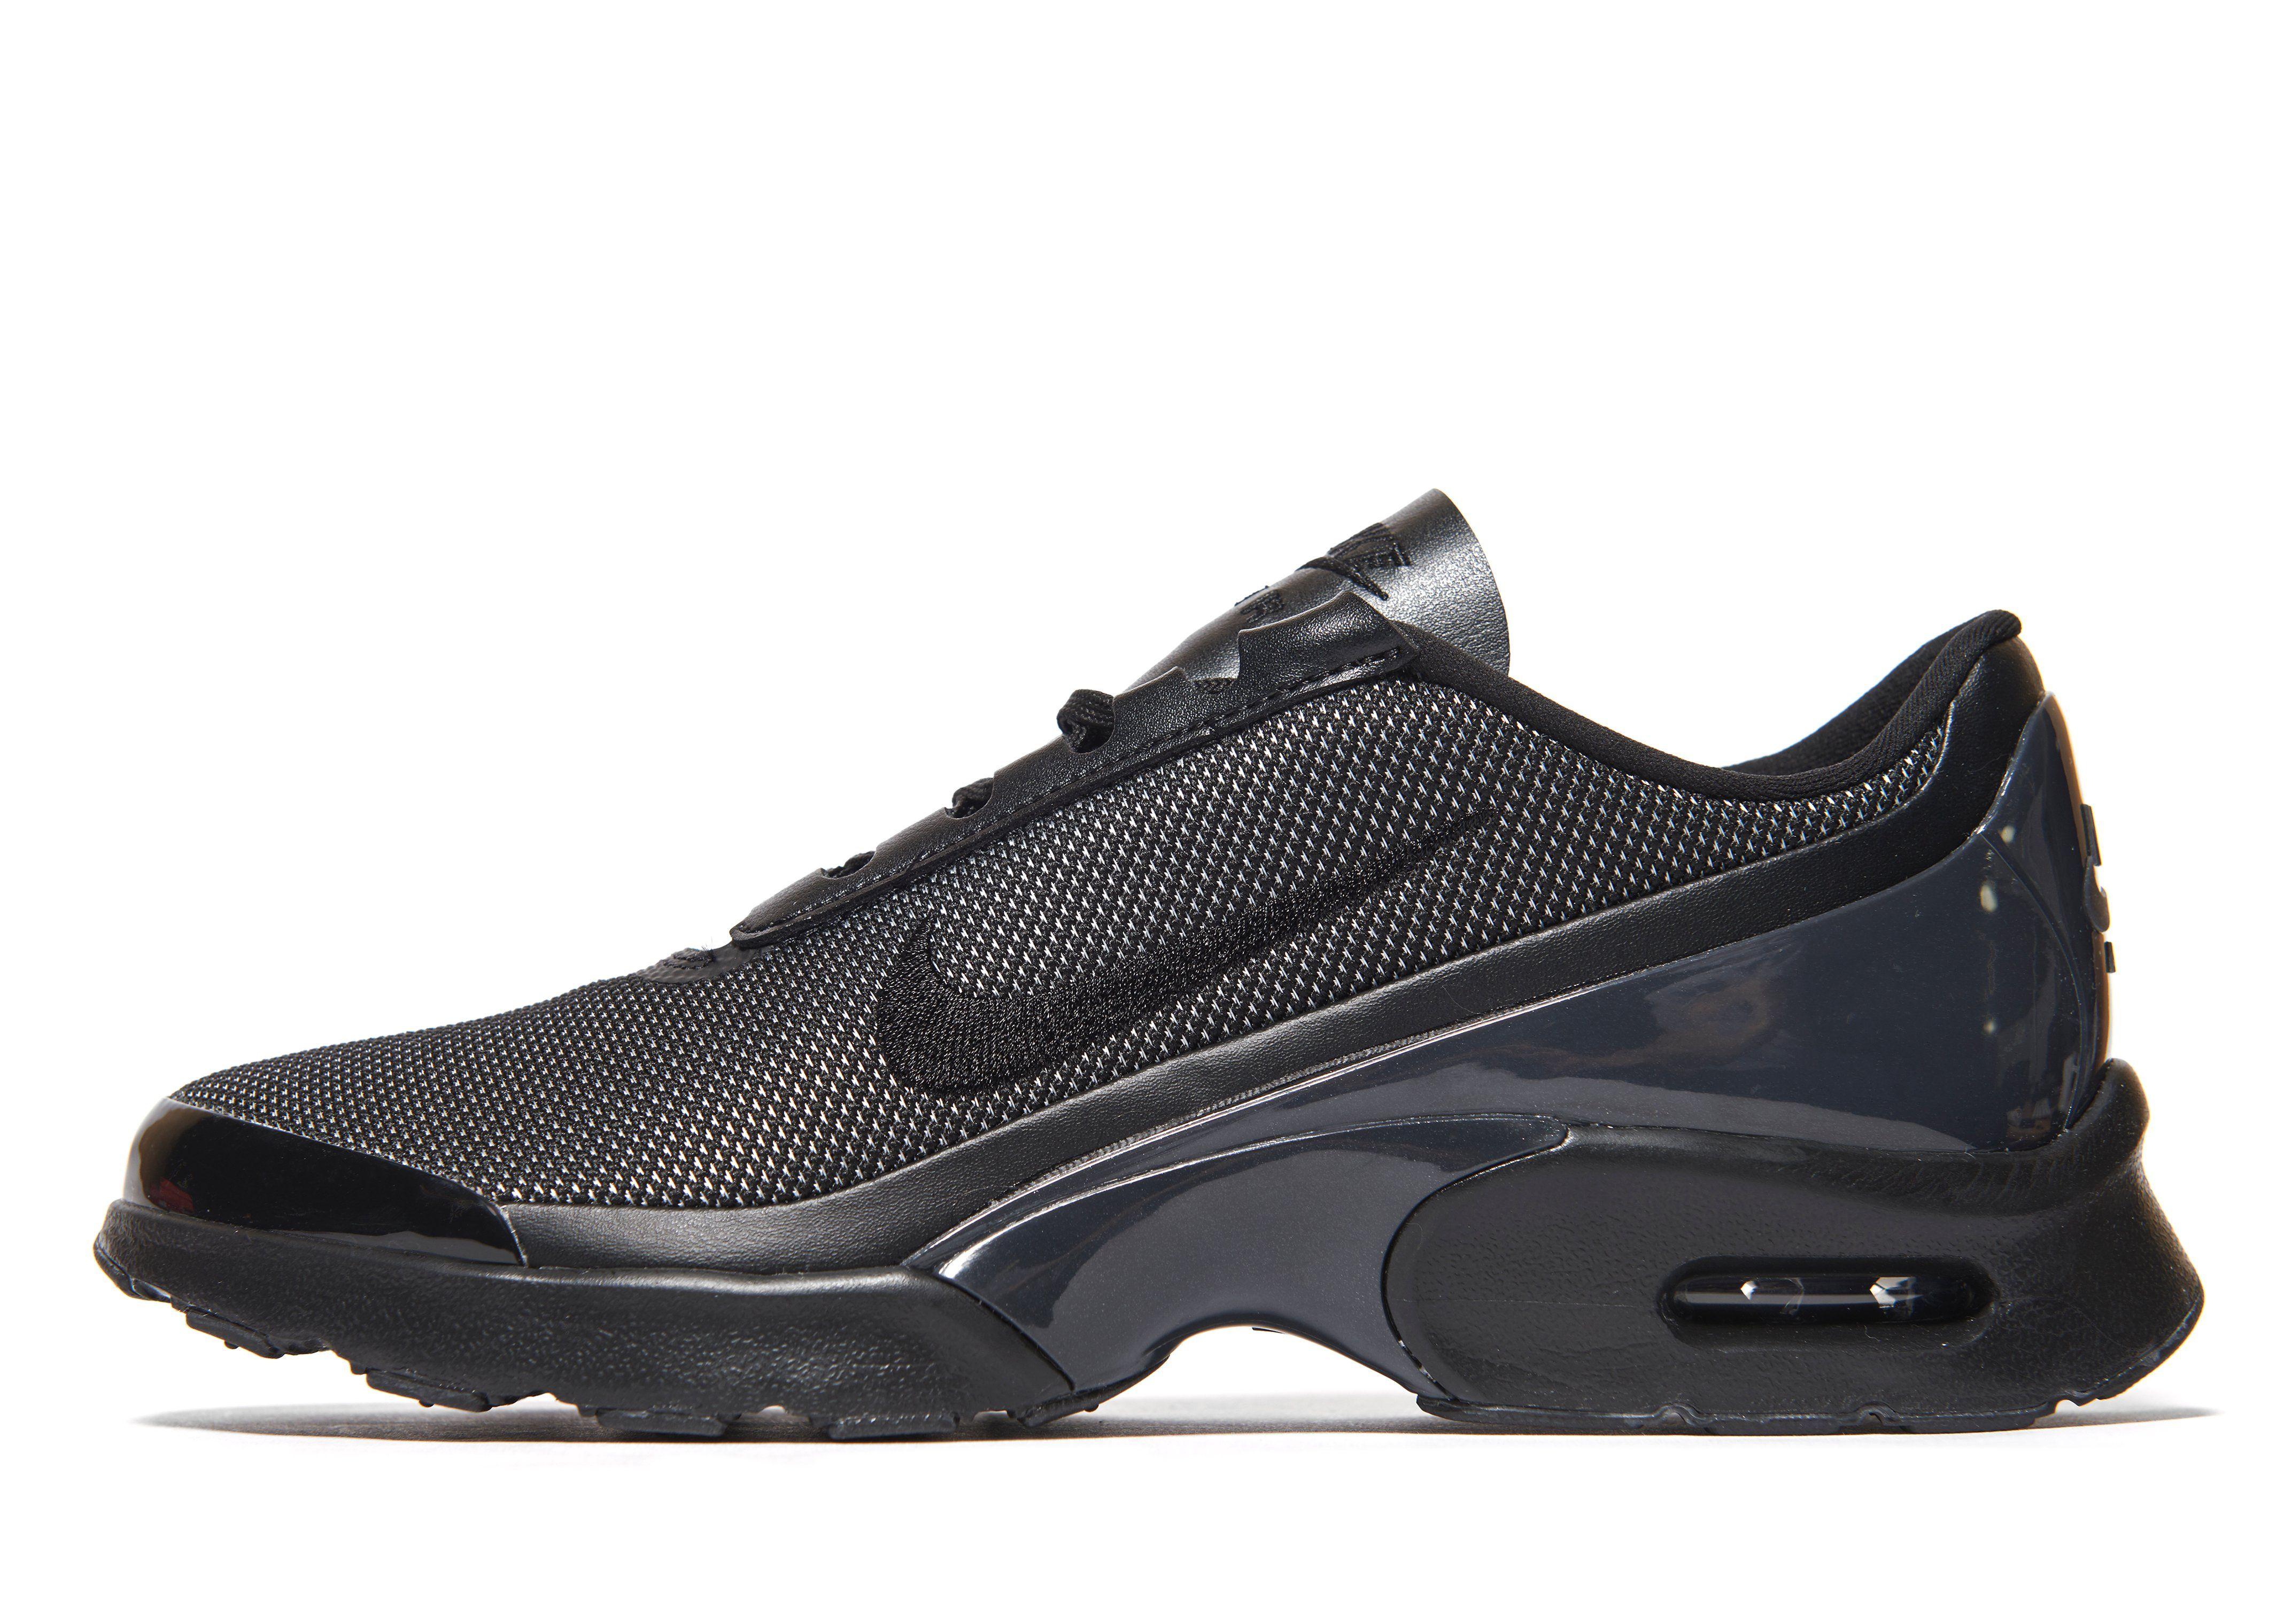 Nike Vapormax Jewel